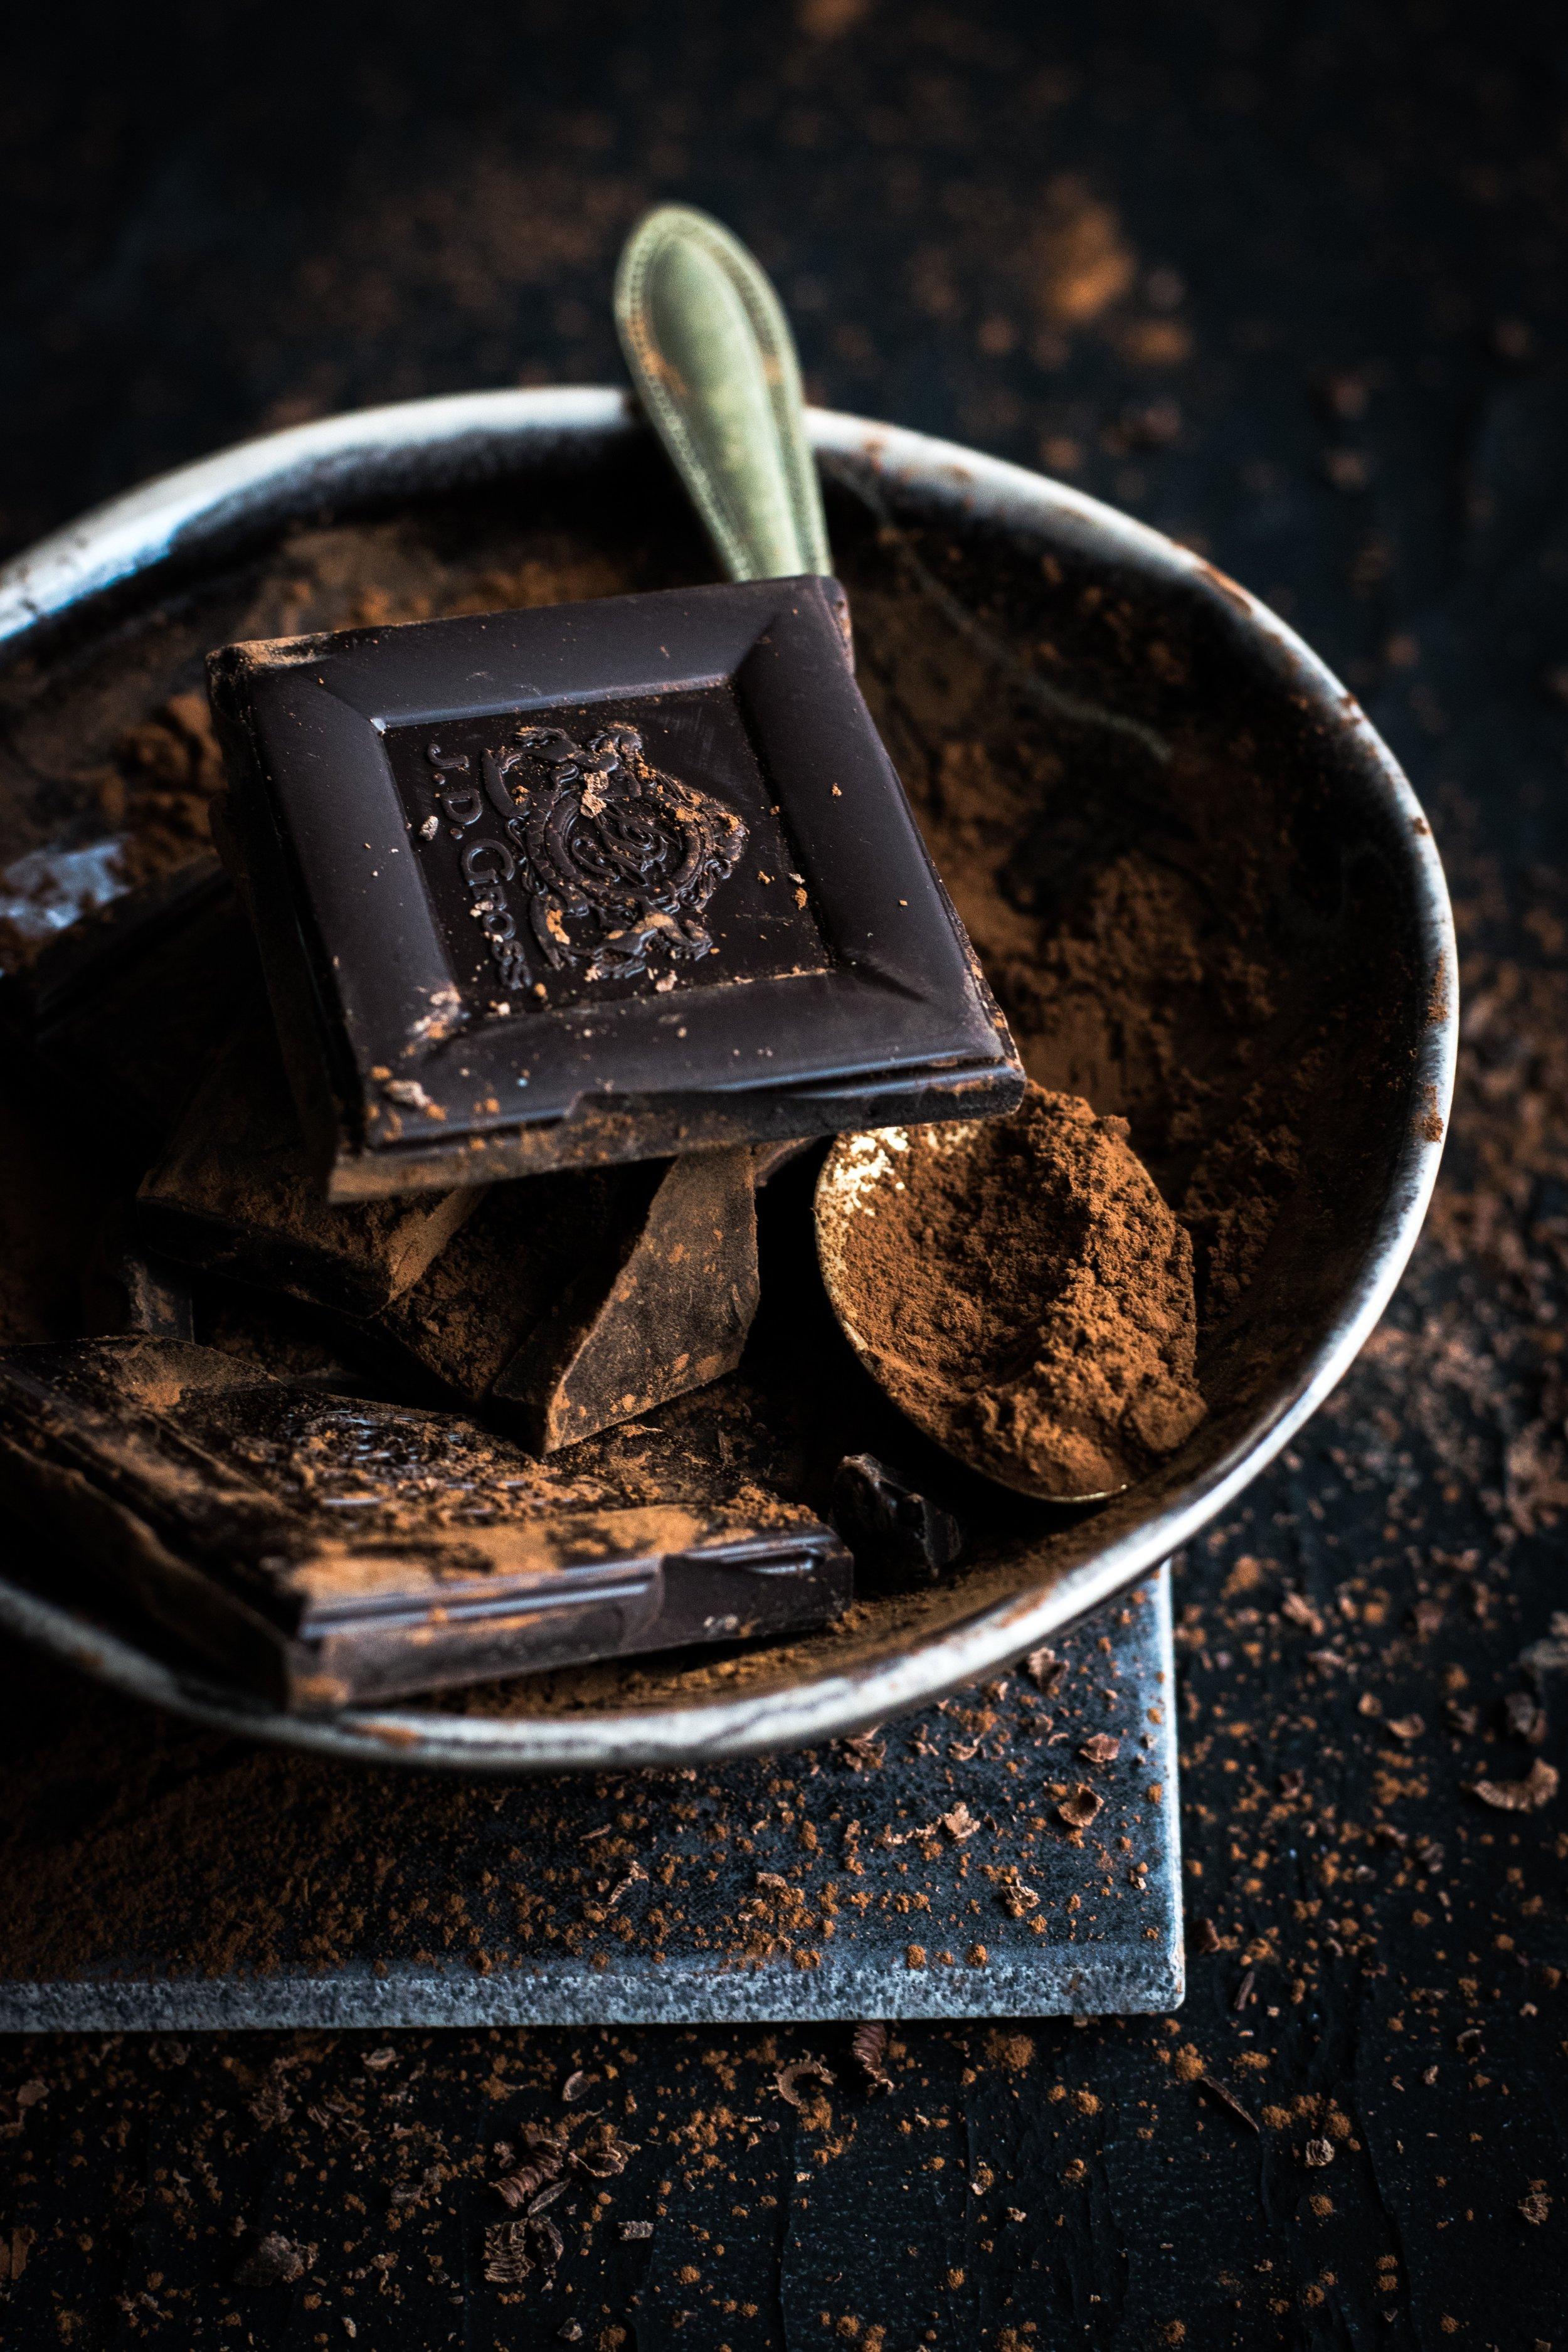 Food as Medicine: Chocolate Peanut Butter Cookies